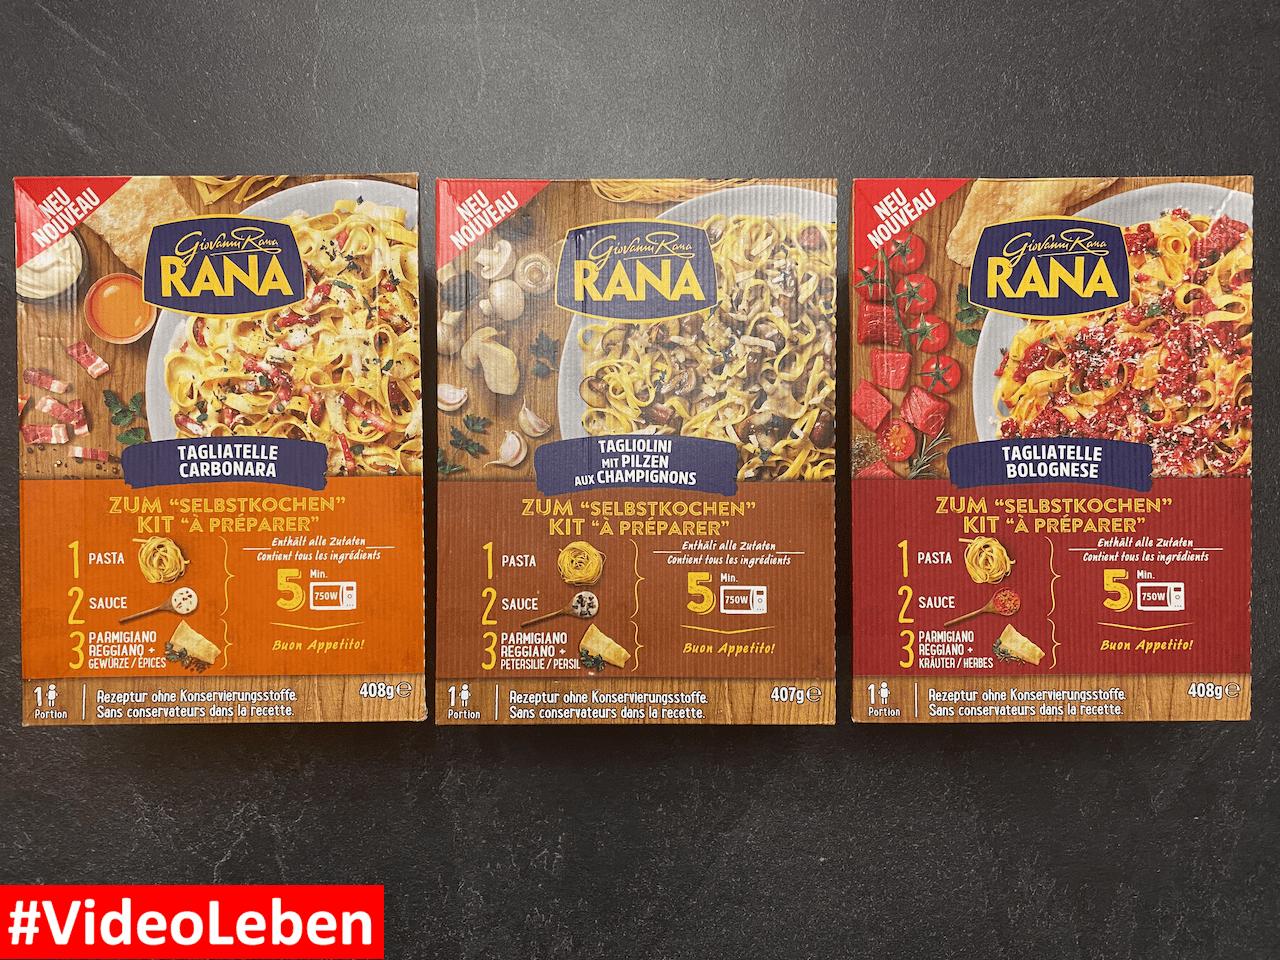 neue Pasta-Sets von Giovanni Rana - wir haben sie getestet - Tagliatelle Bolognese - Tagliatelle Carbonara - Tagliolini mit Pilzen - Gnocchi alla Sorrentina - Rezeptfamilie - Videoleben - Familyeller